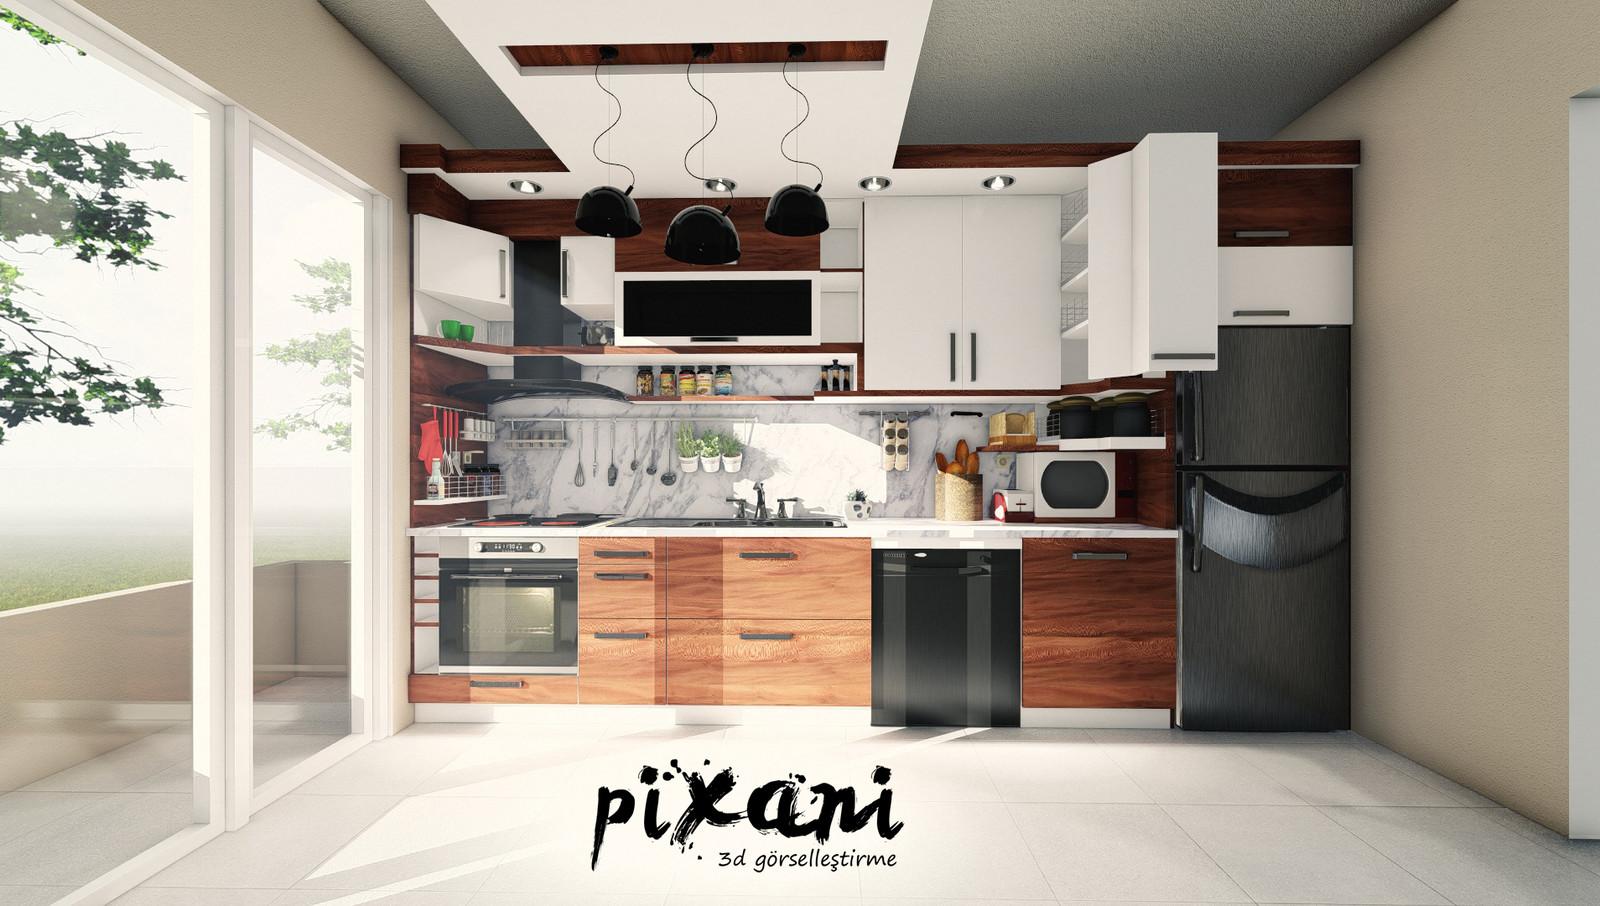 KITCHEN DESIGN 1 Architect & CG Artist : Serdar Çakmak rendered and designed in Pixani Studios www.pix-ani.com